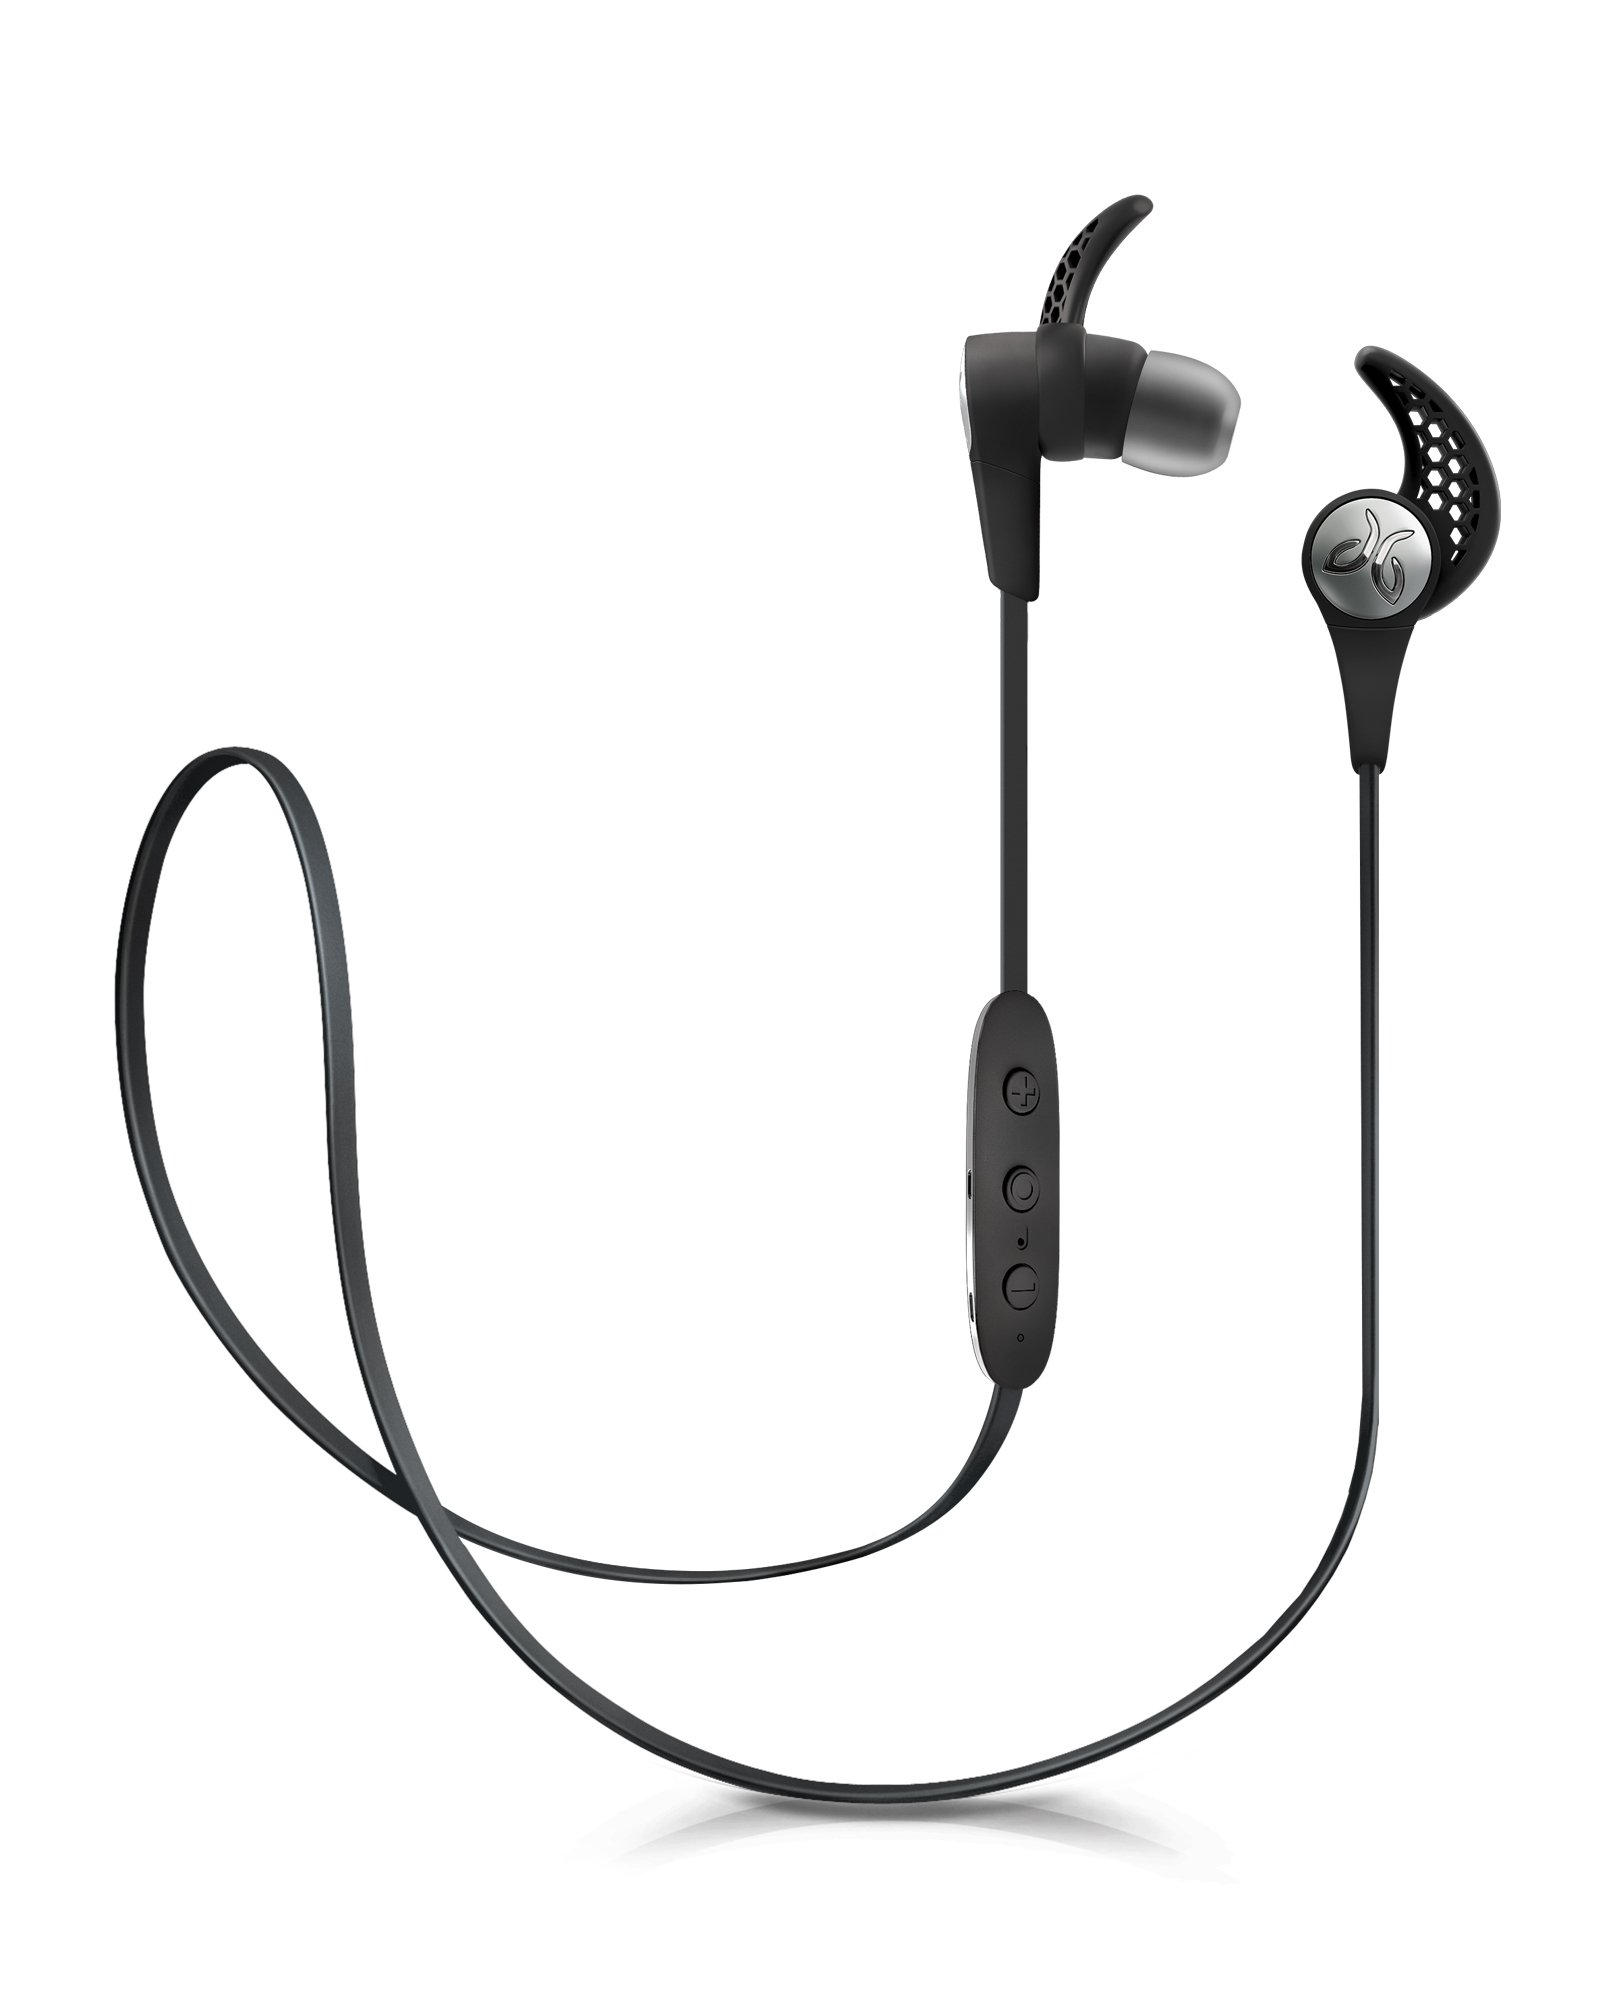 Jaybird X3 in-Ear Wireless Bluetooth Sports Headphones – Sweat-Proof – Universal Fit – 8 Hours Battery Life – Blackout by Jaybird